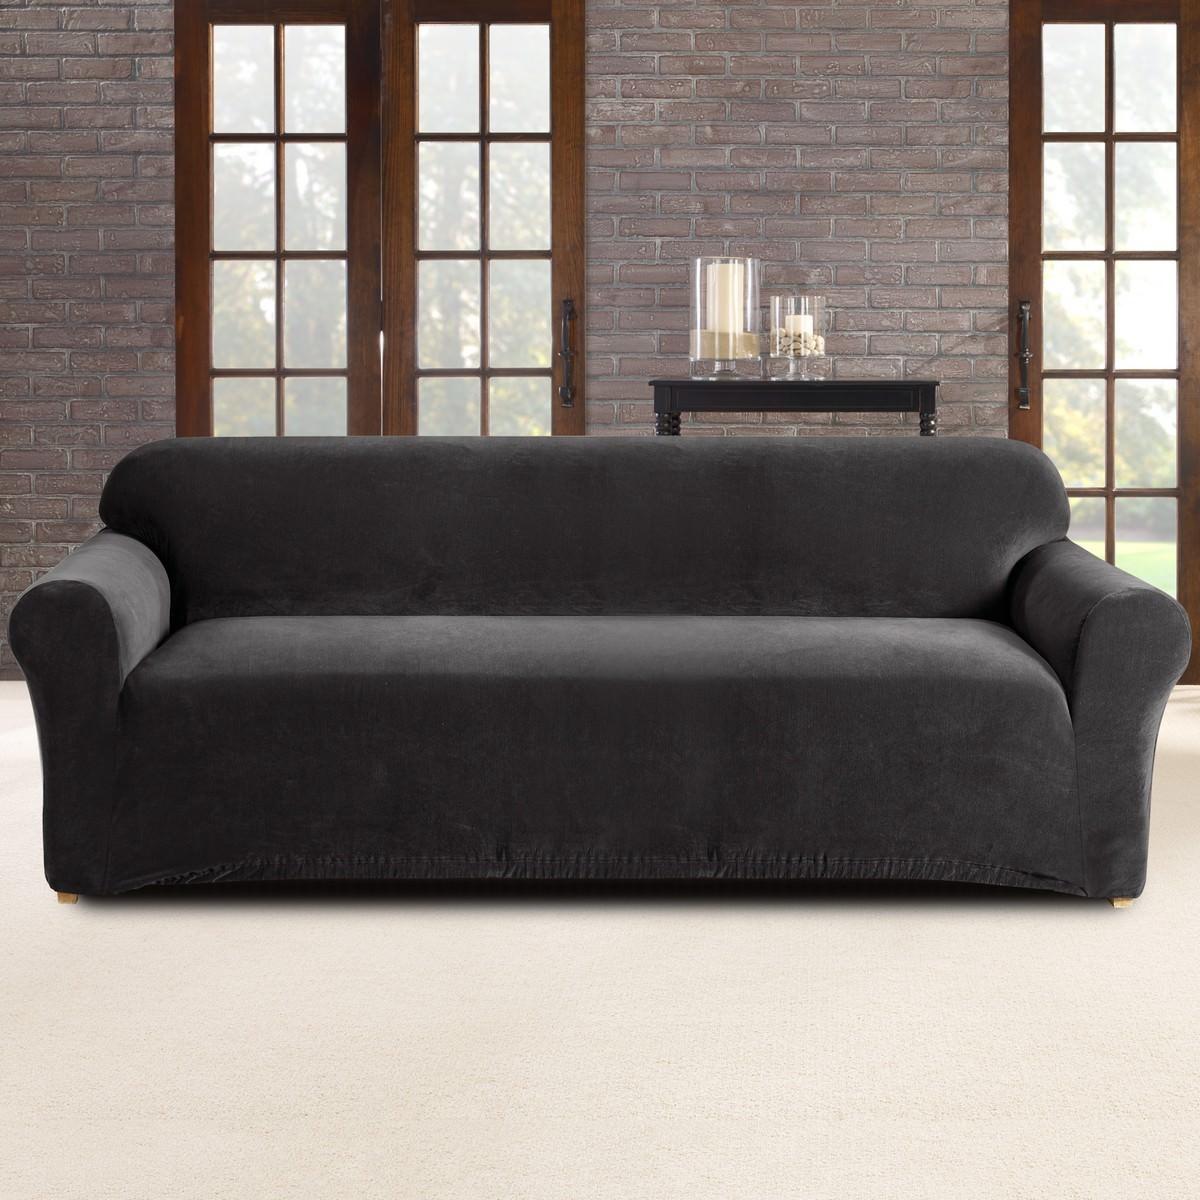 Sure Fit Stretch Pearson Sofa Cover, 3 Seater, Ebony